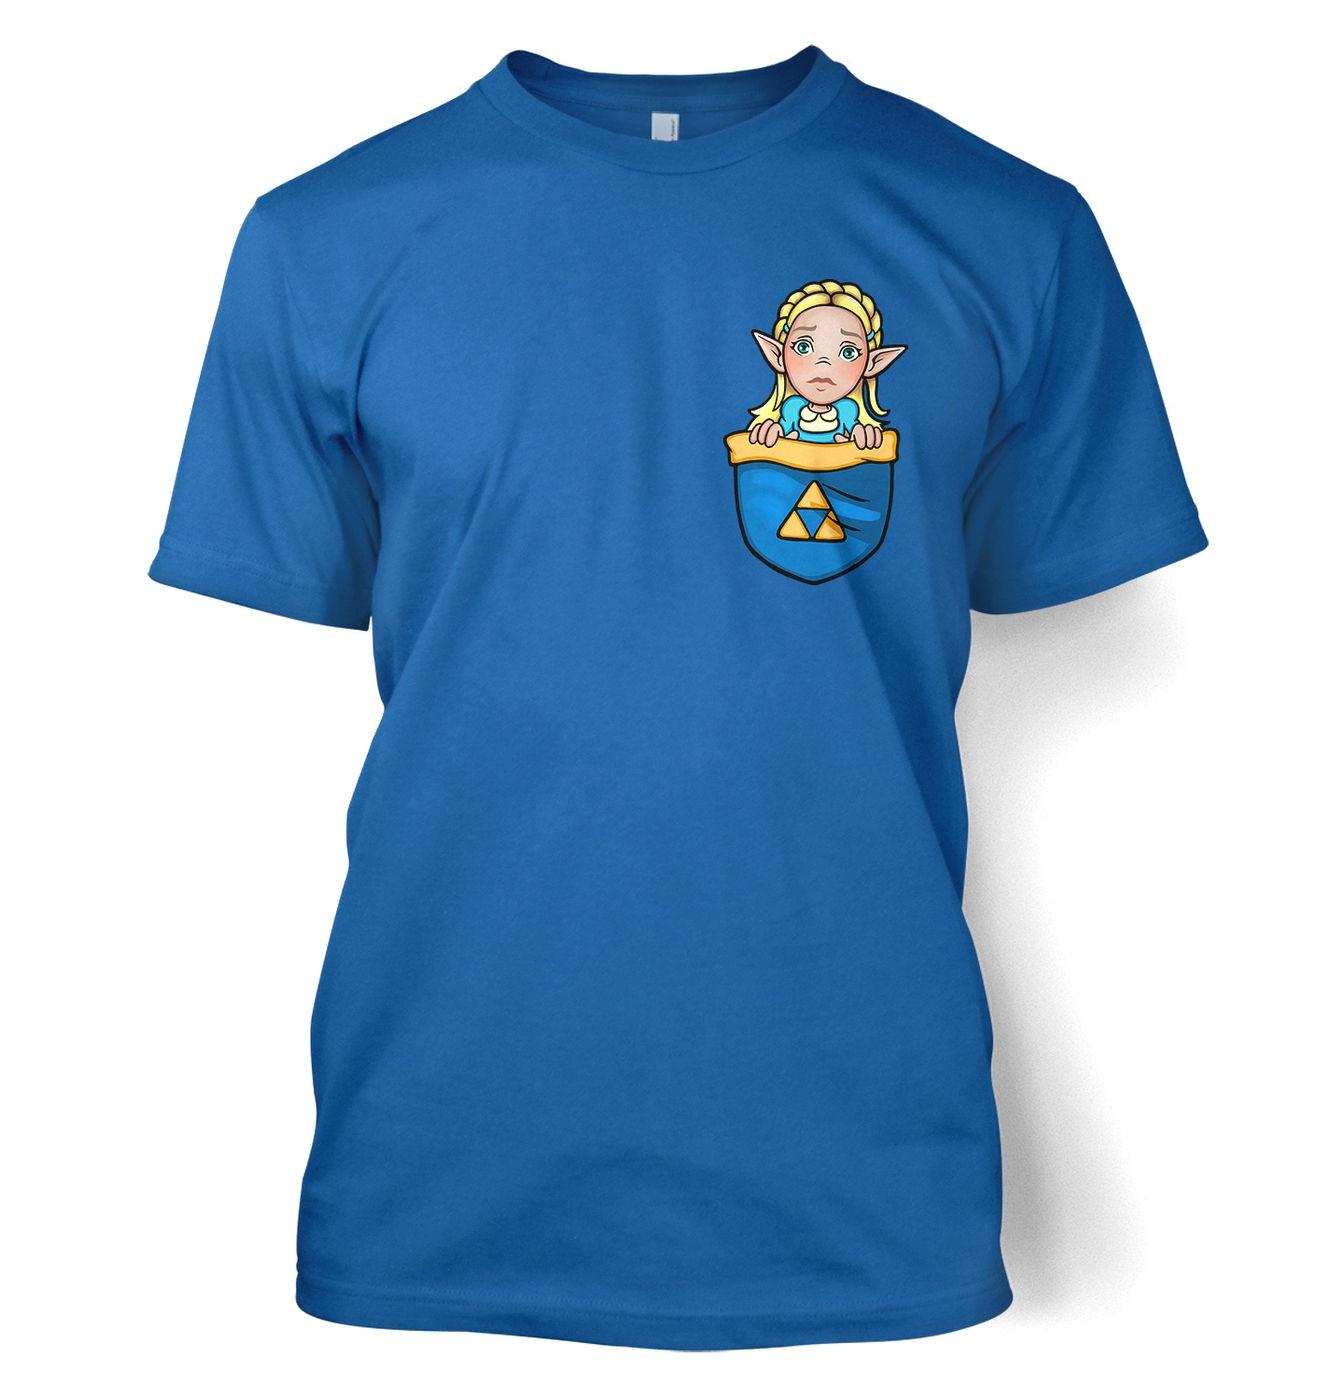 Pocket Zelda t-shirt by Something Geeky